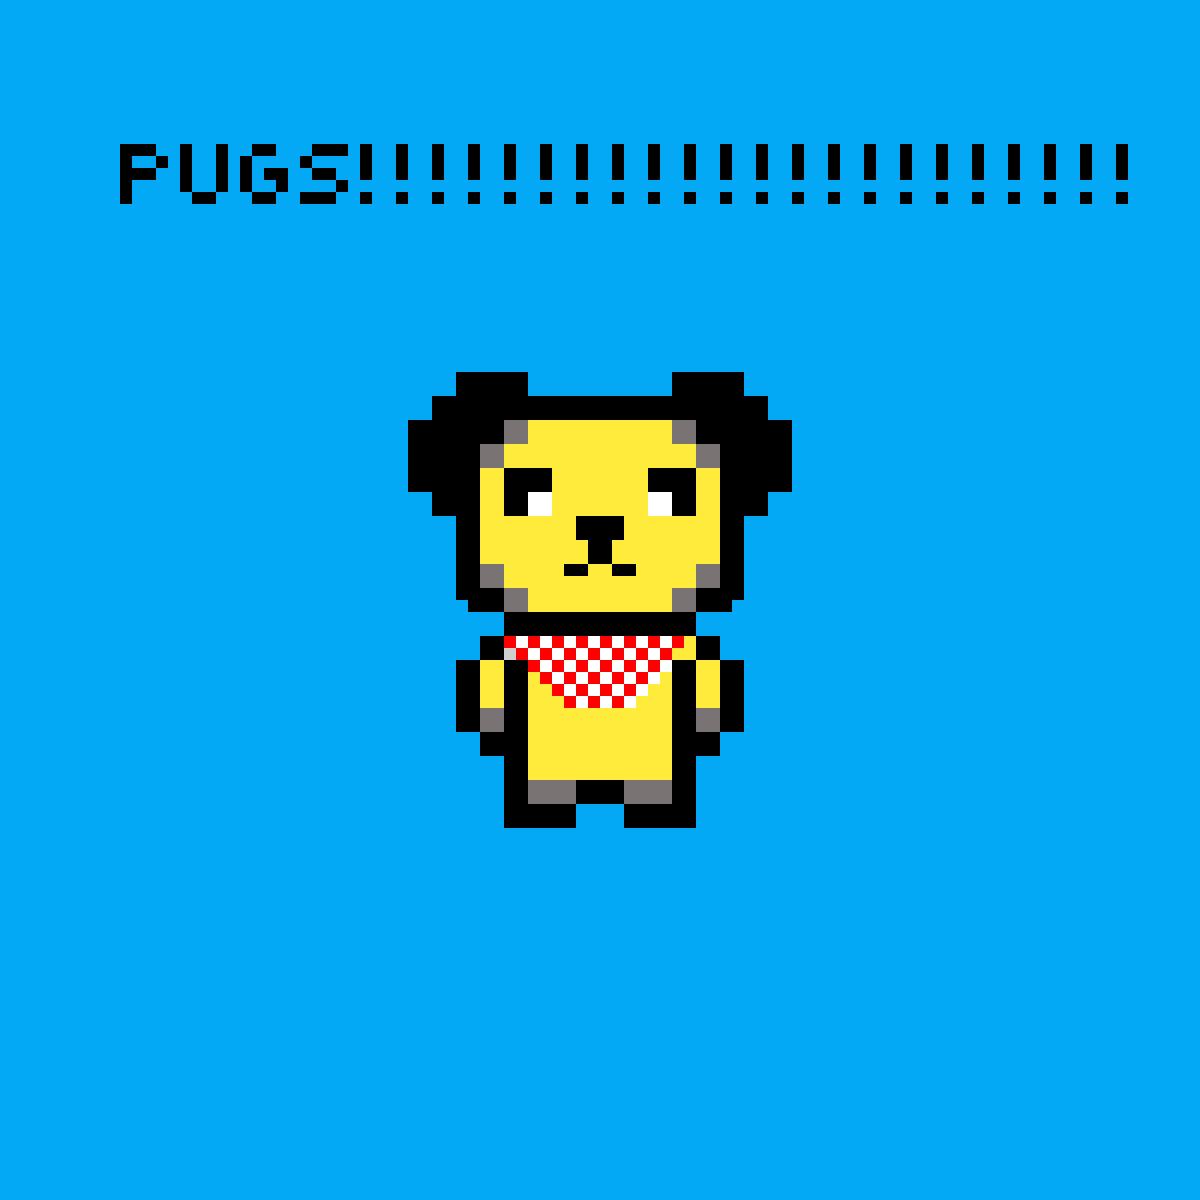 PUGSSSSSSSSSSSSSSSSSSSSSSS by pugsarethebest